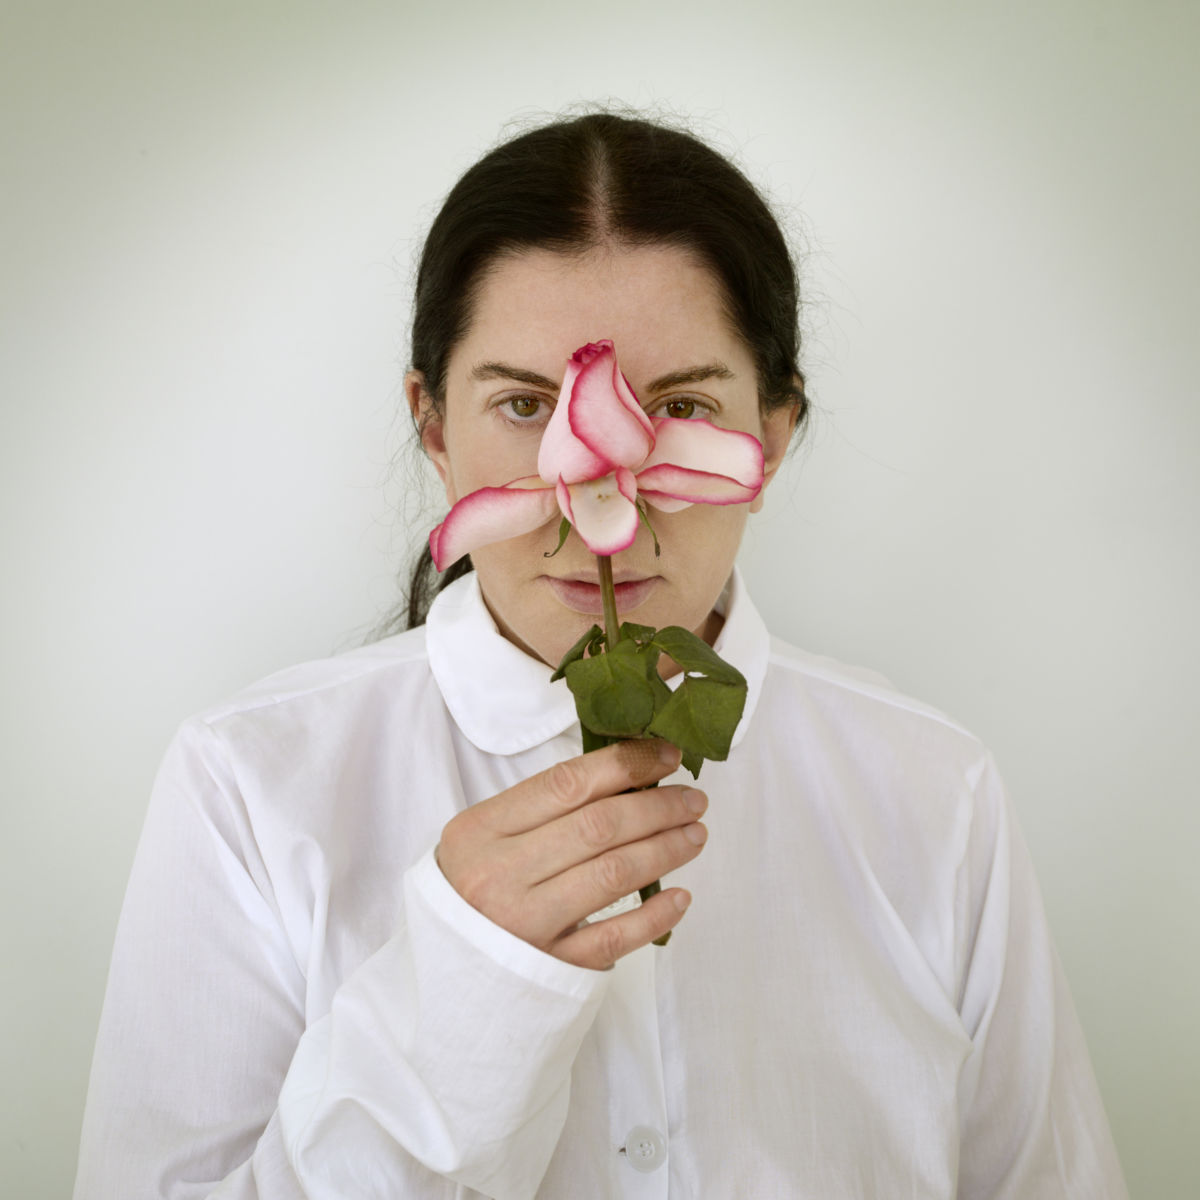 ArtInternational2014-Marina Abramović - Artist Portrait with a Rose, 2013